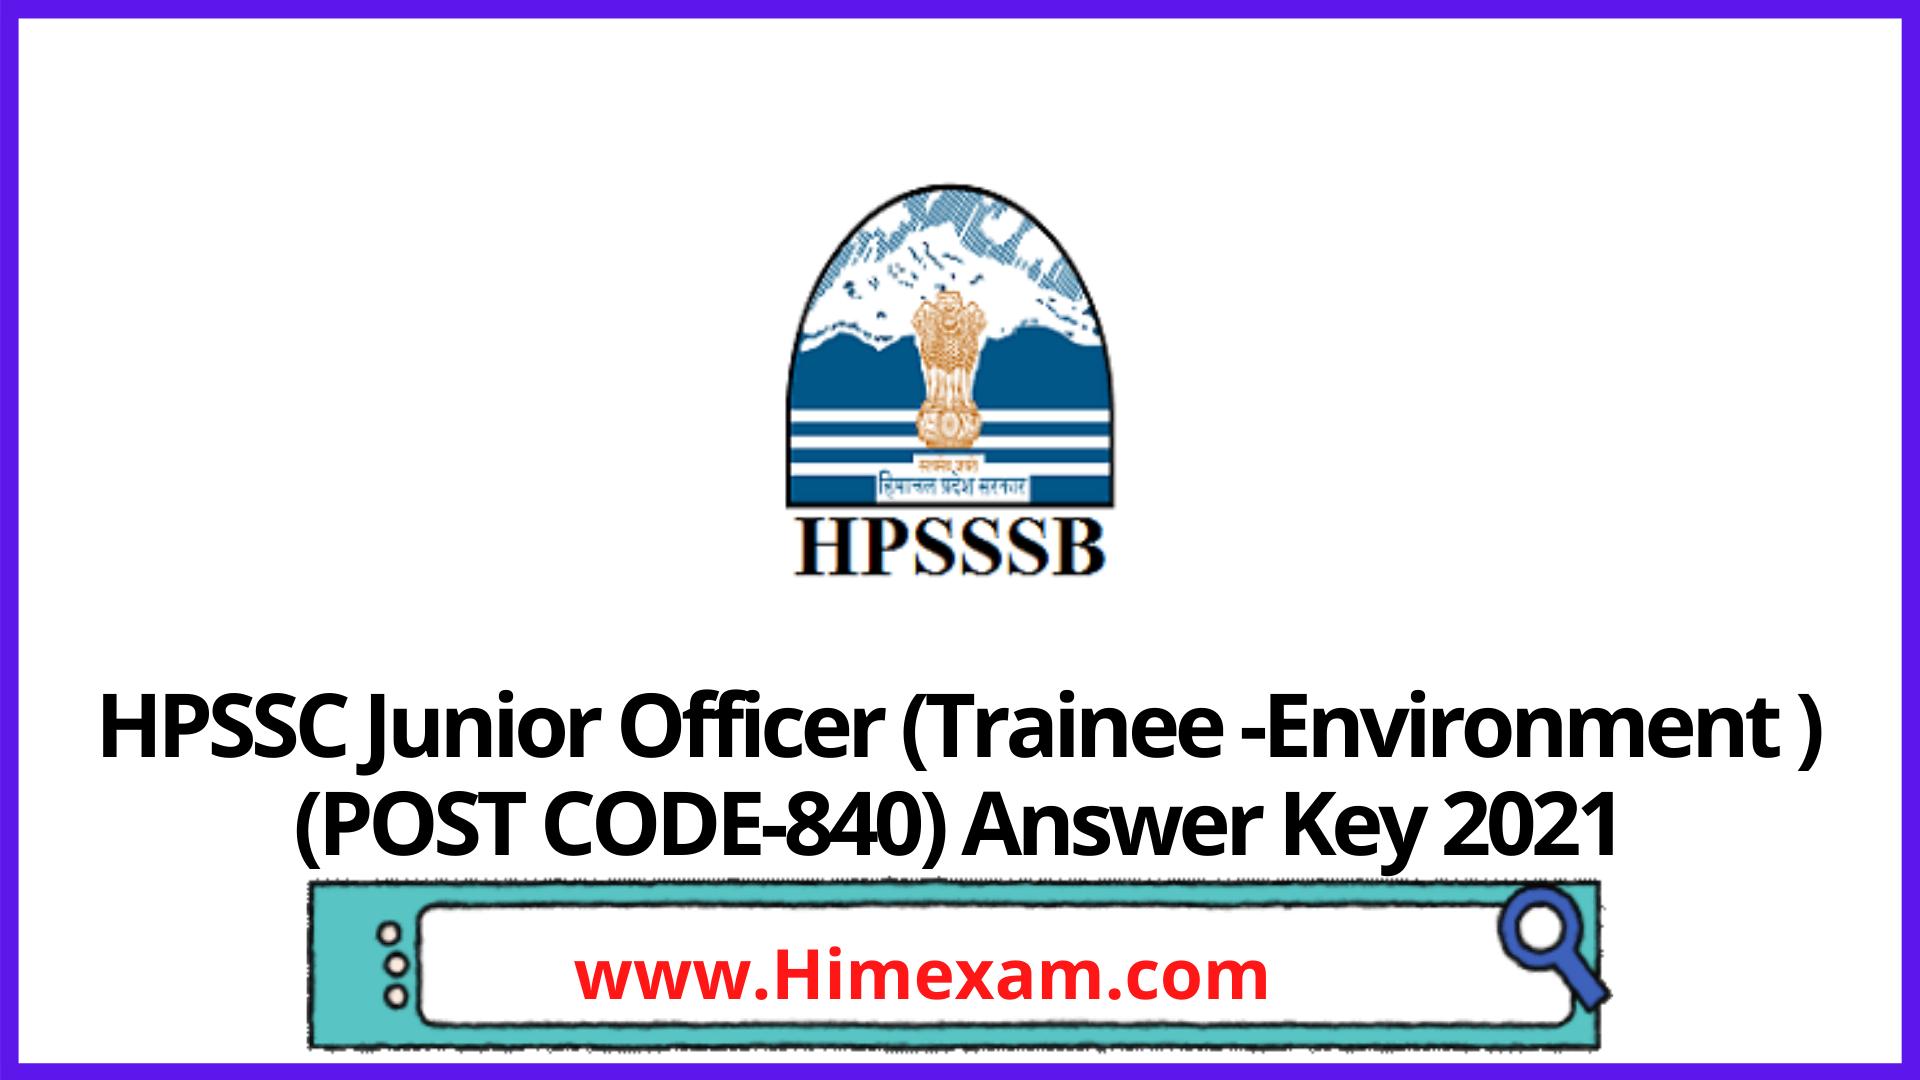 HPSSC Junior Officer (Trainee -Environment ) (POST CODE-840) Answer Key 2021